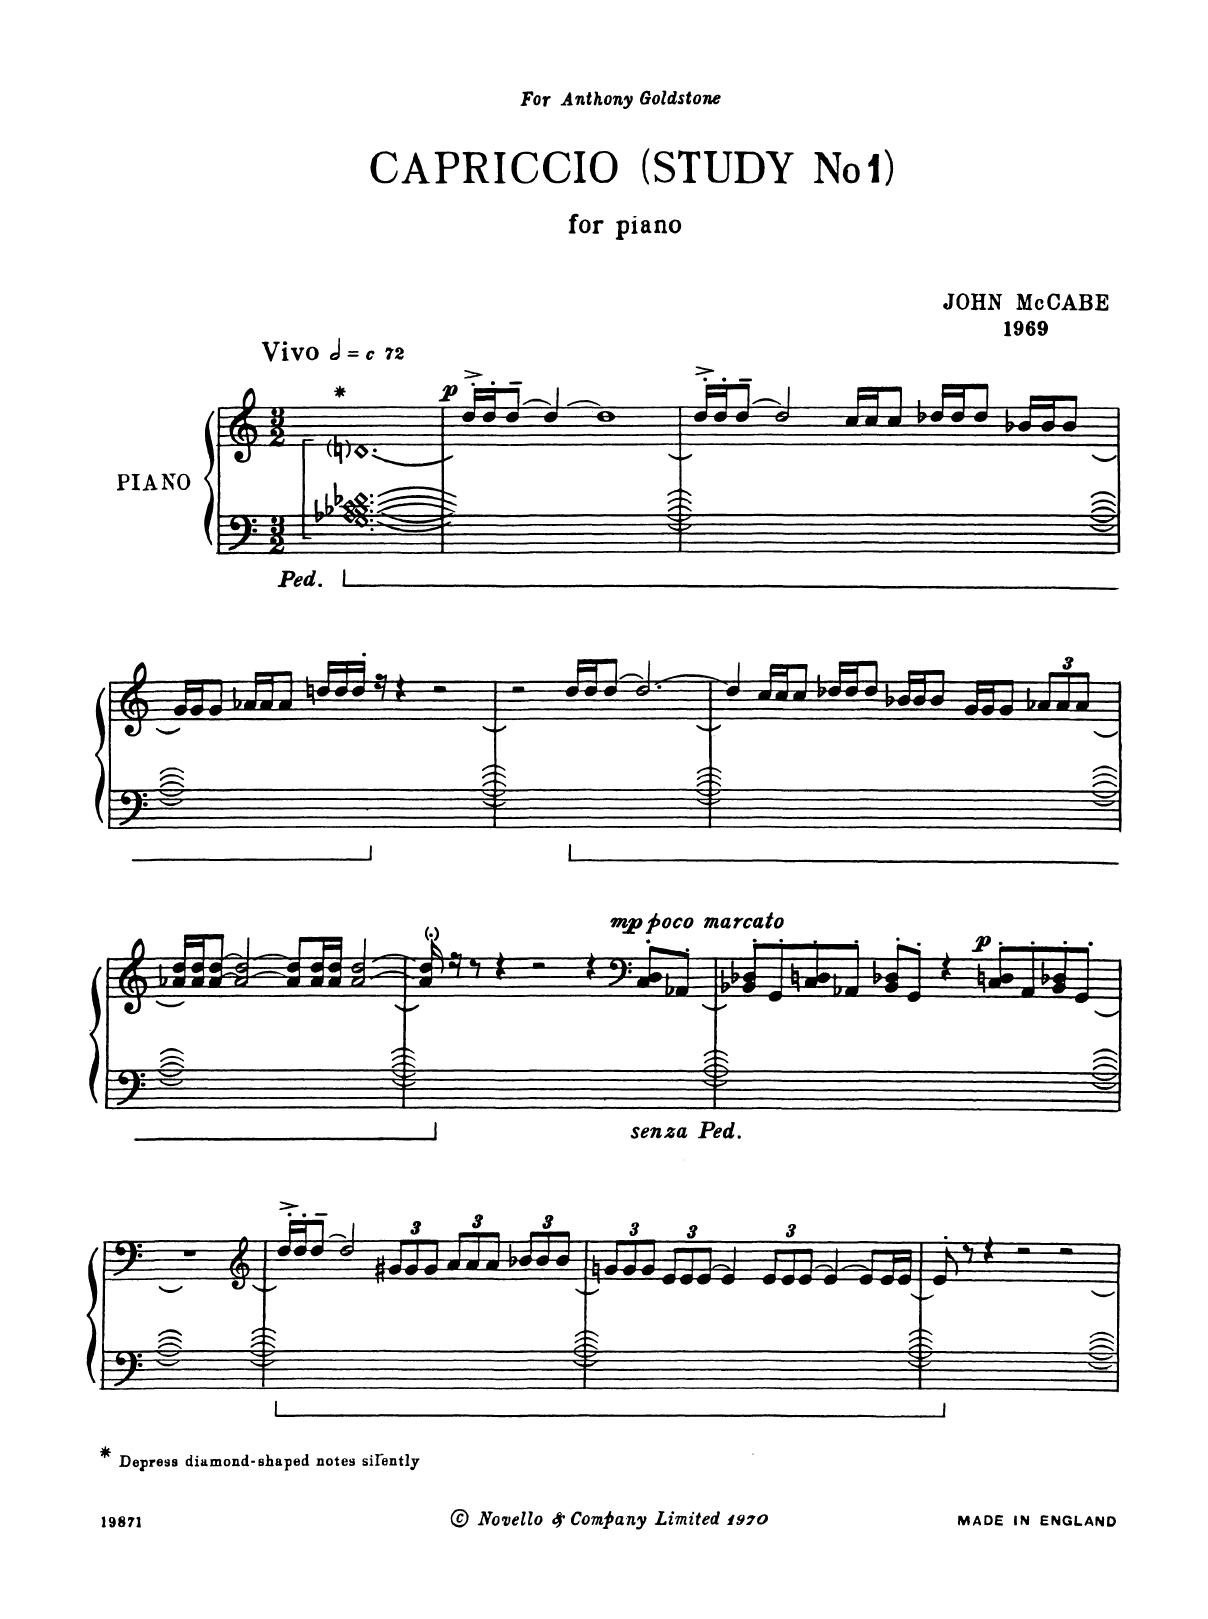 Capriccio (Study No. 1) Partition Digitale